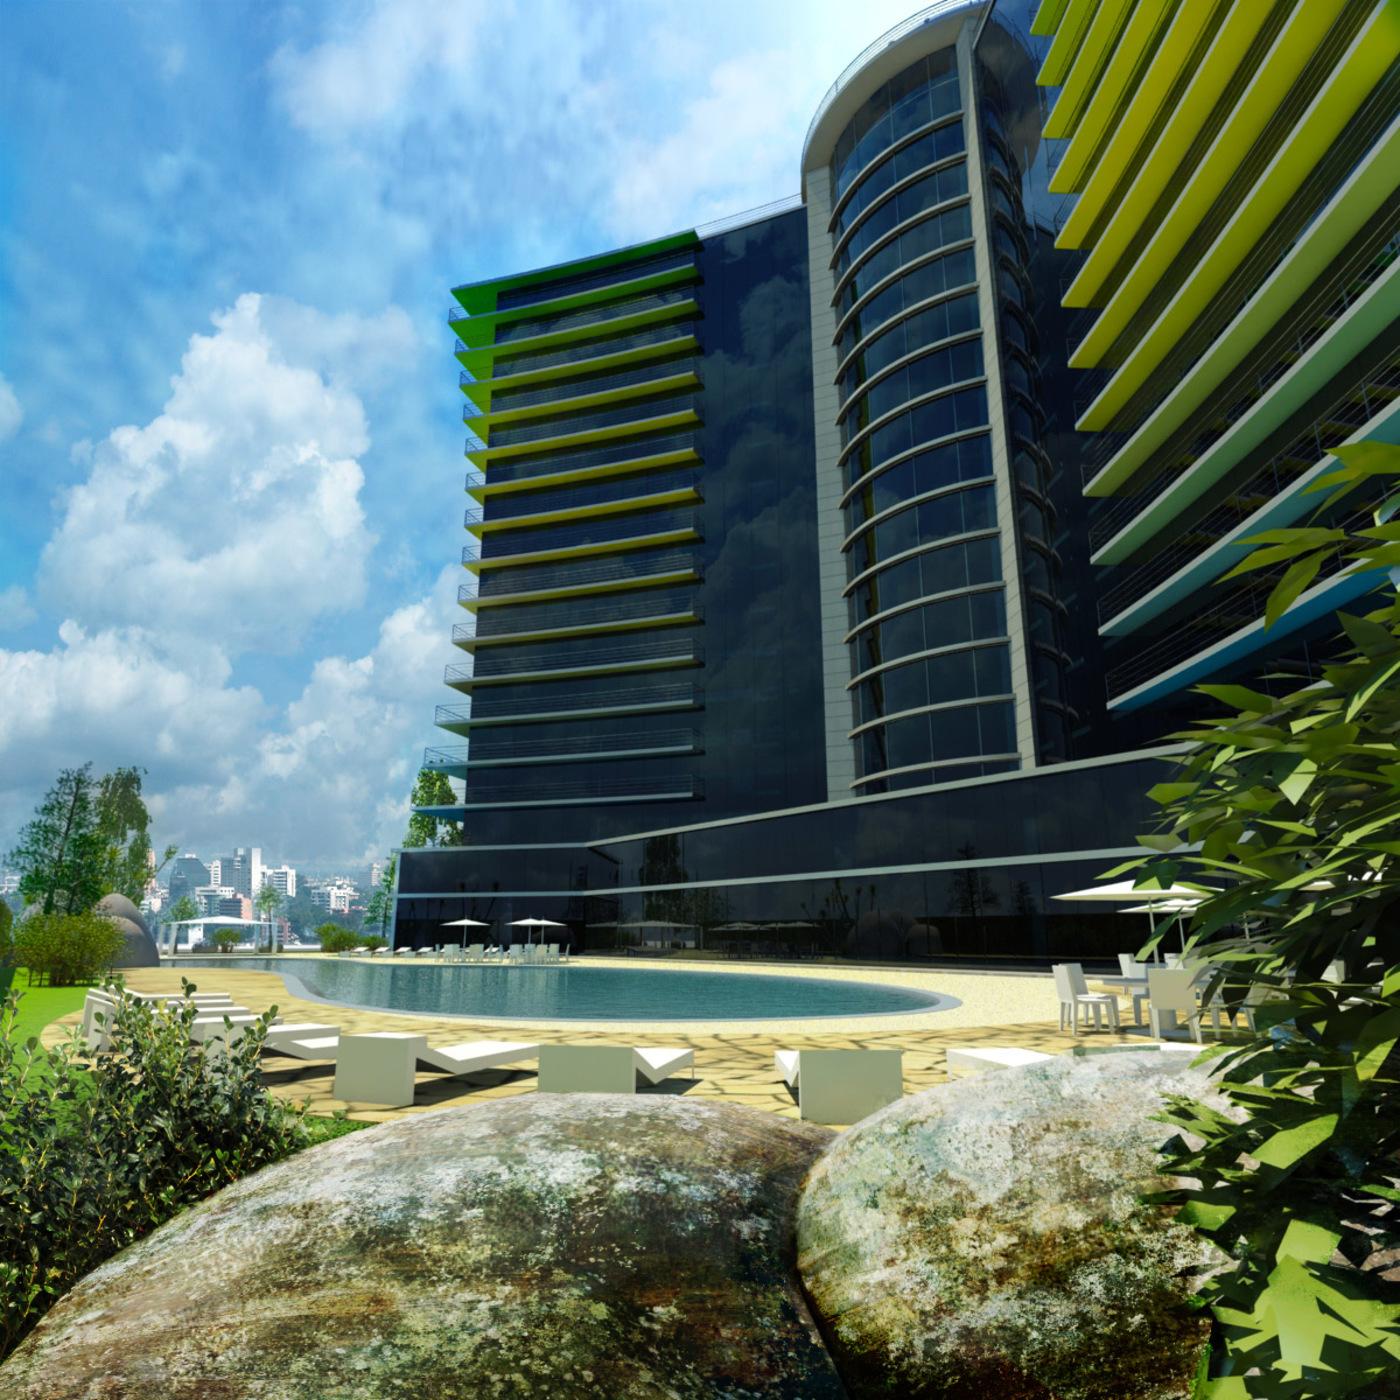 The Amazonian Hotel Facades